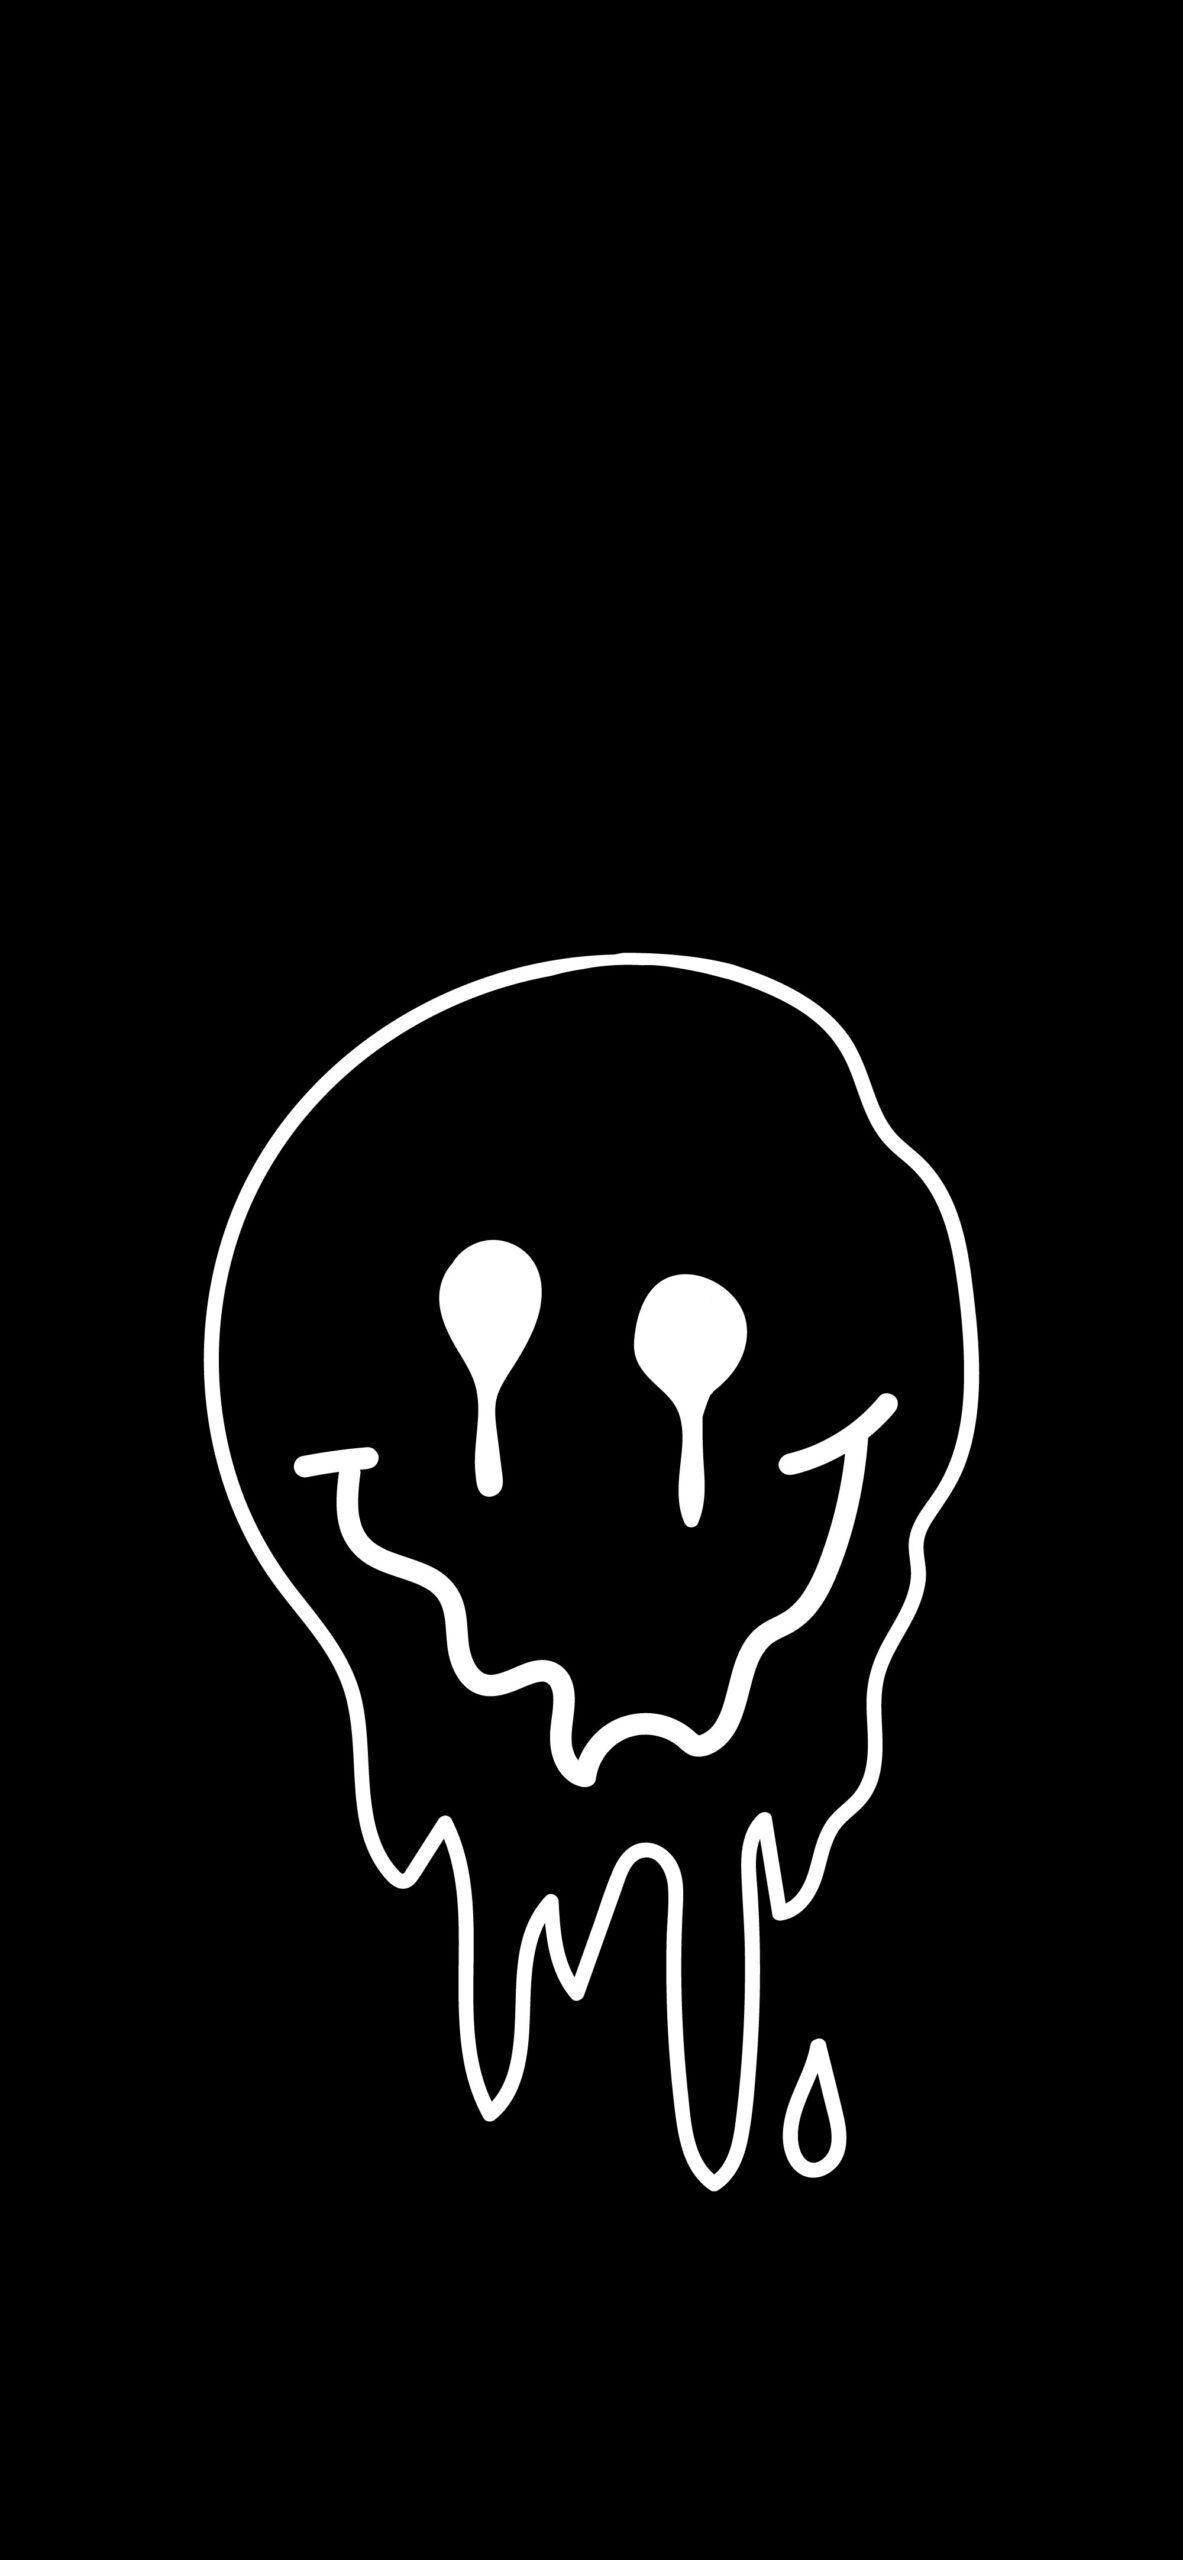 drip face black wallpaper